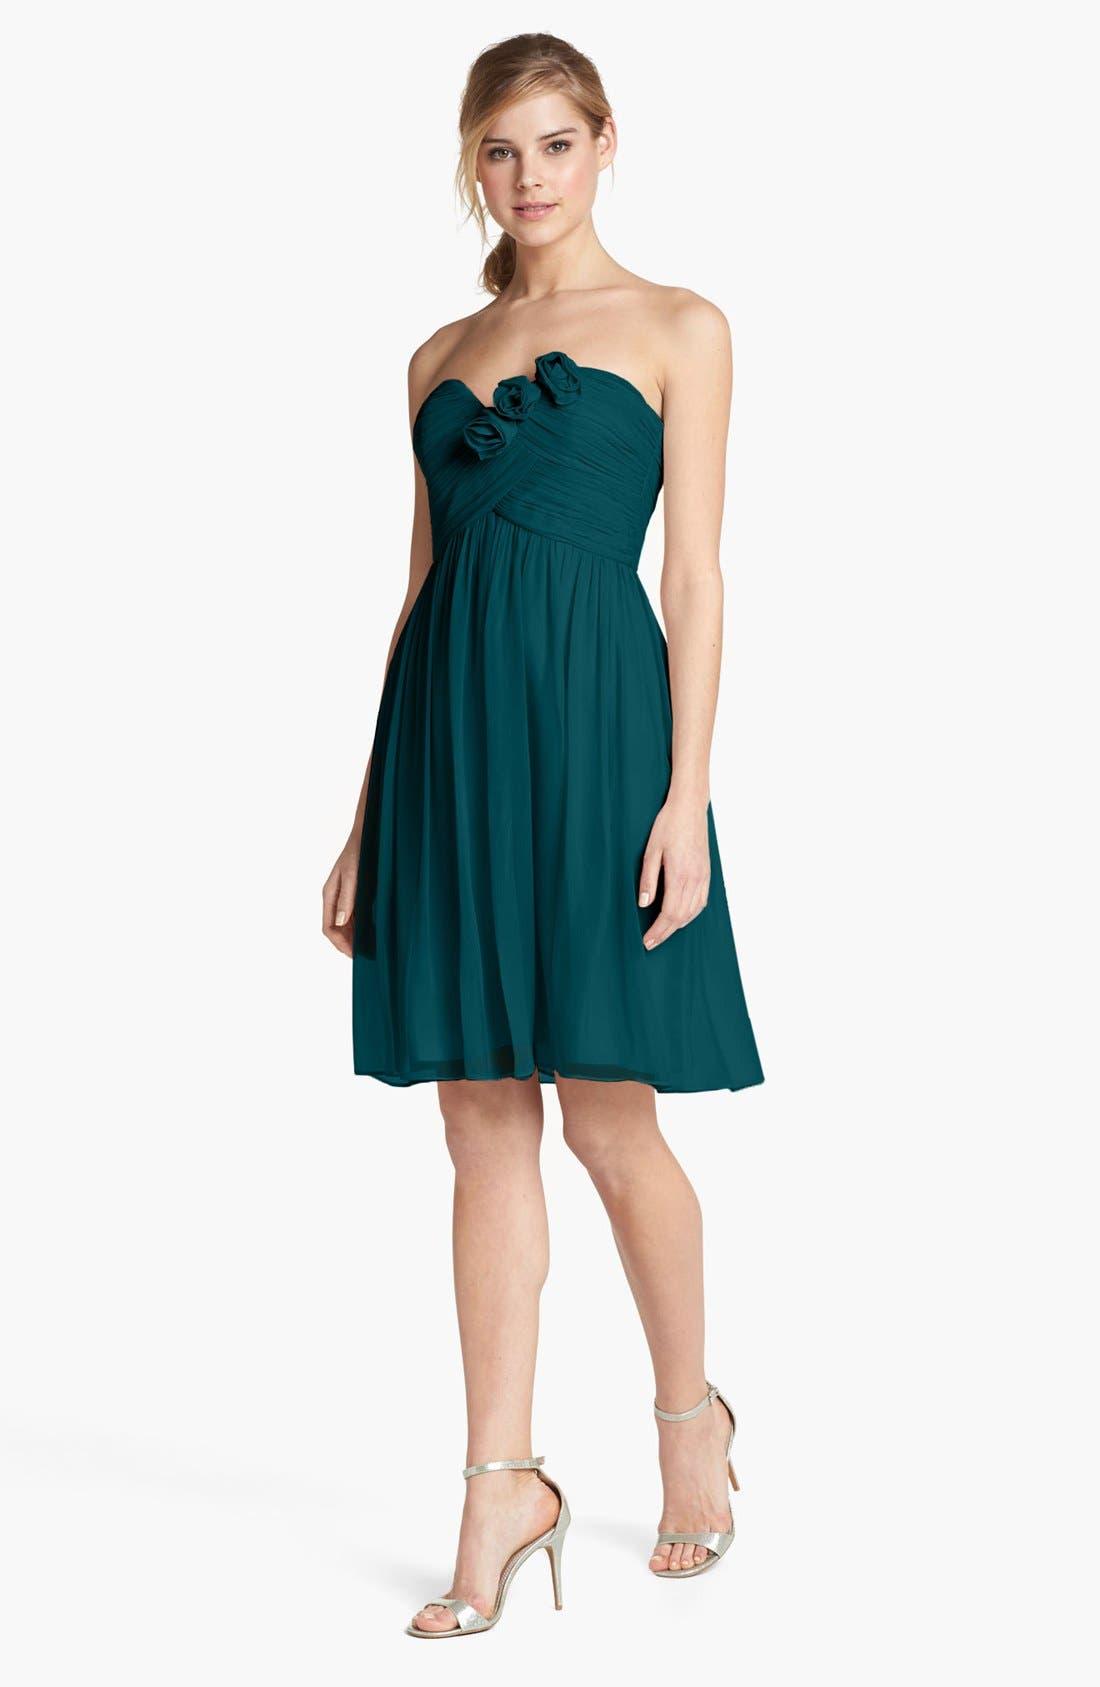 Alternate Image 1 Selected - Donna Morgan 'Mary' Strapless Silk Chiffon Dress